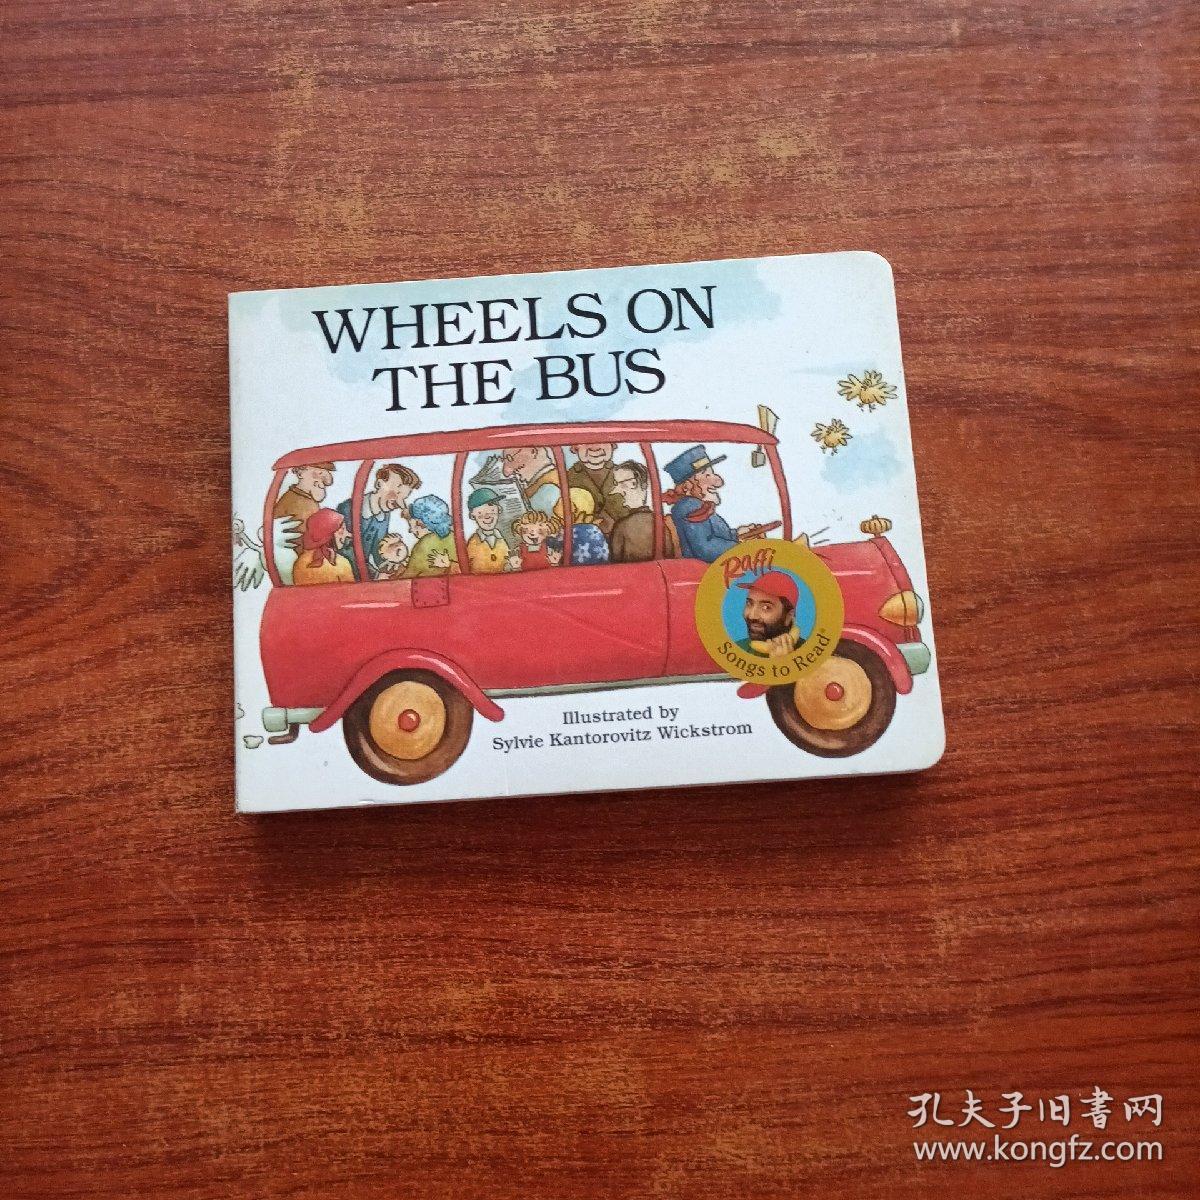 Wheels on the Bus公车上的轮子 英文原版